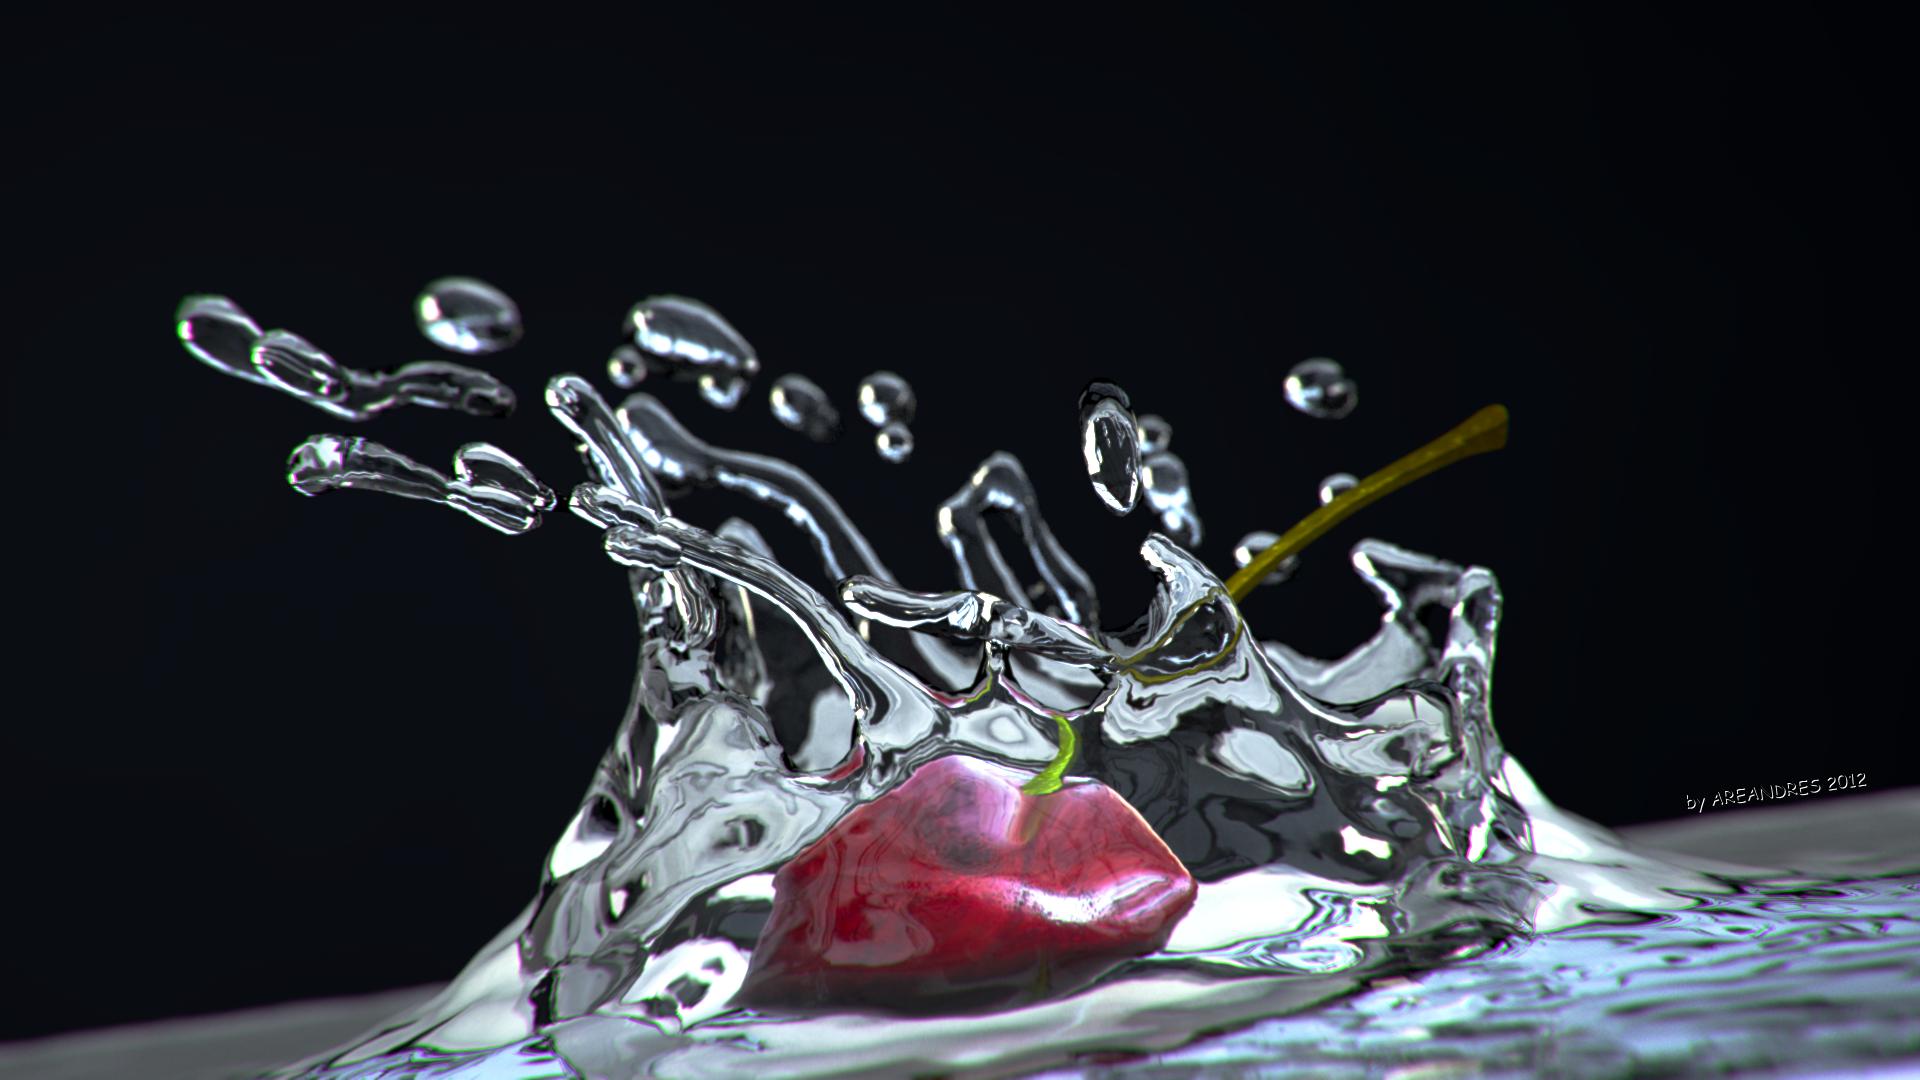 Cherry fluid wallpaper by areandres on deviantart - Fluid wallpaper ...